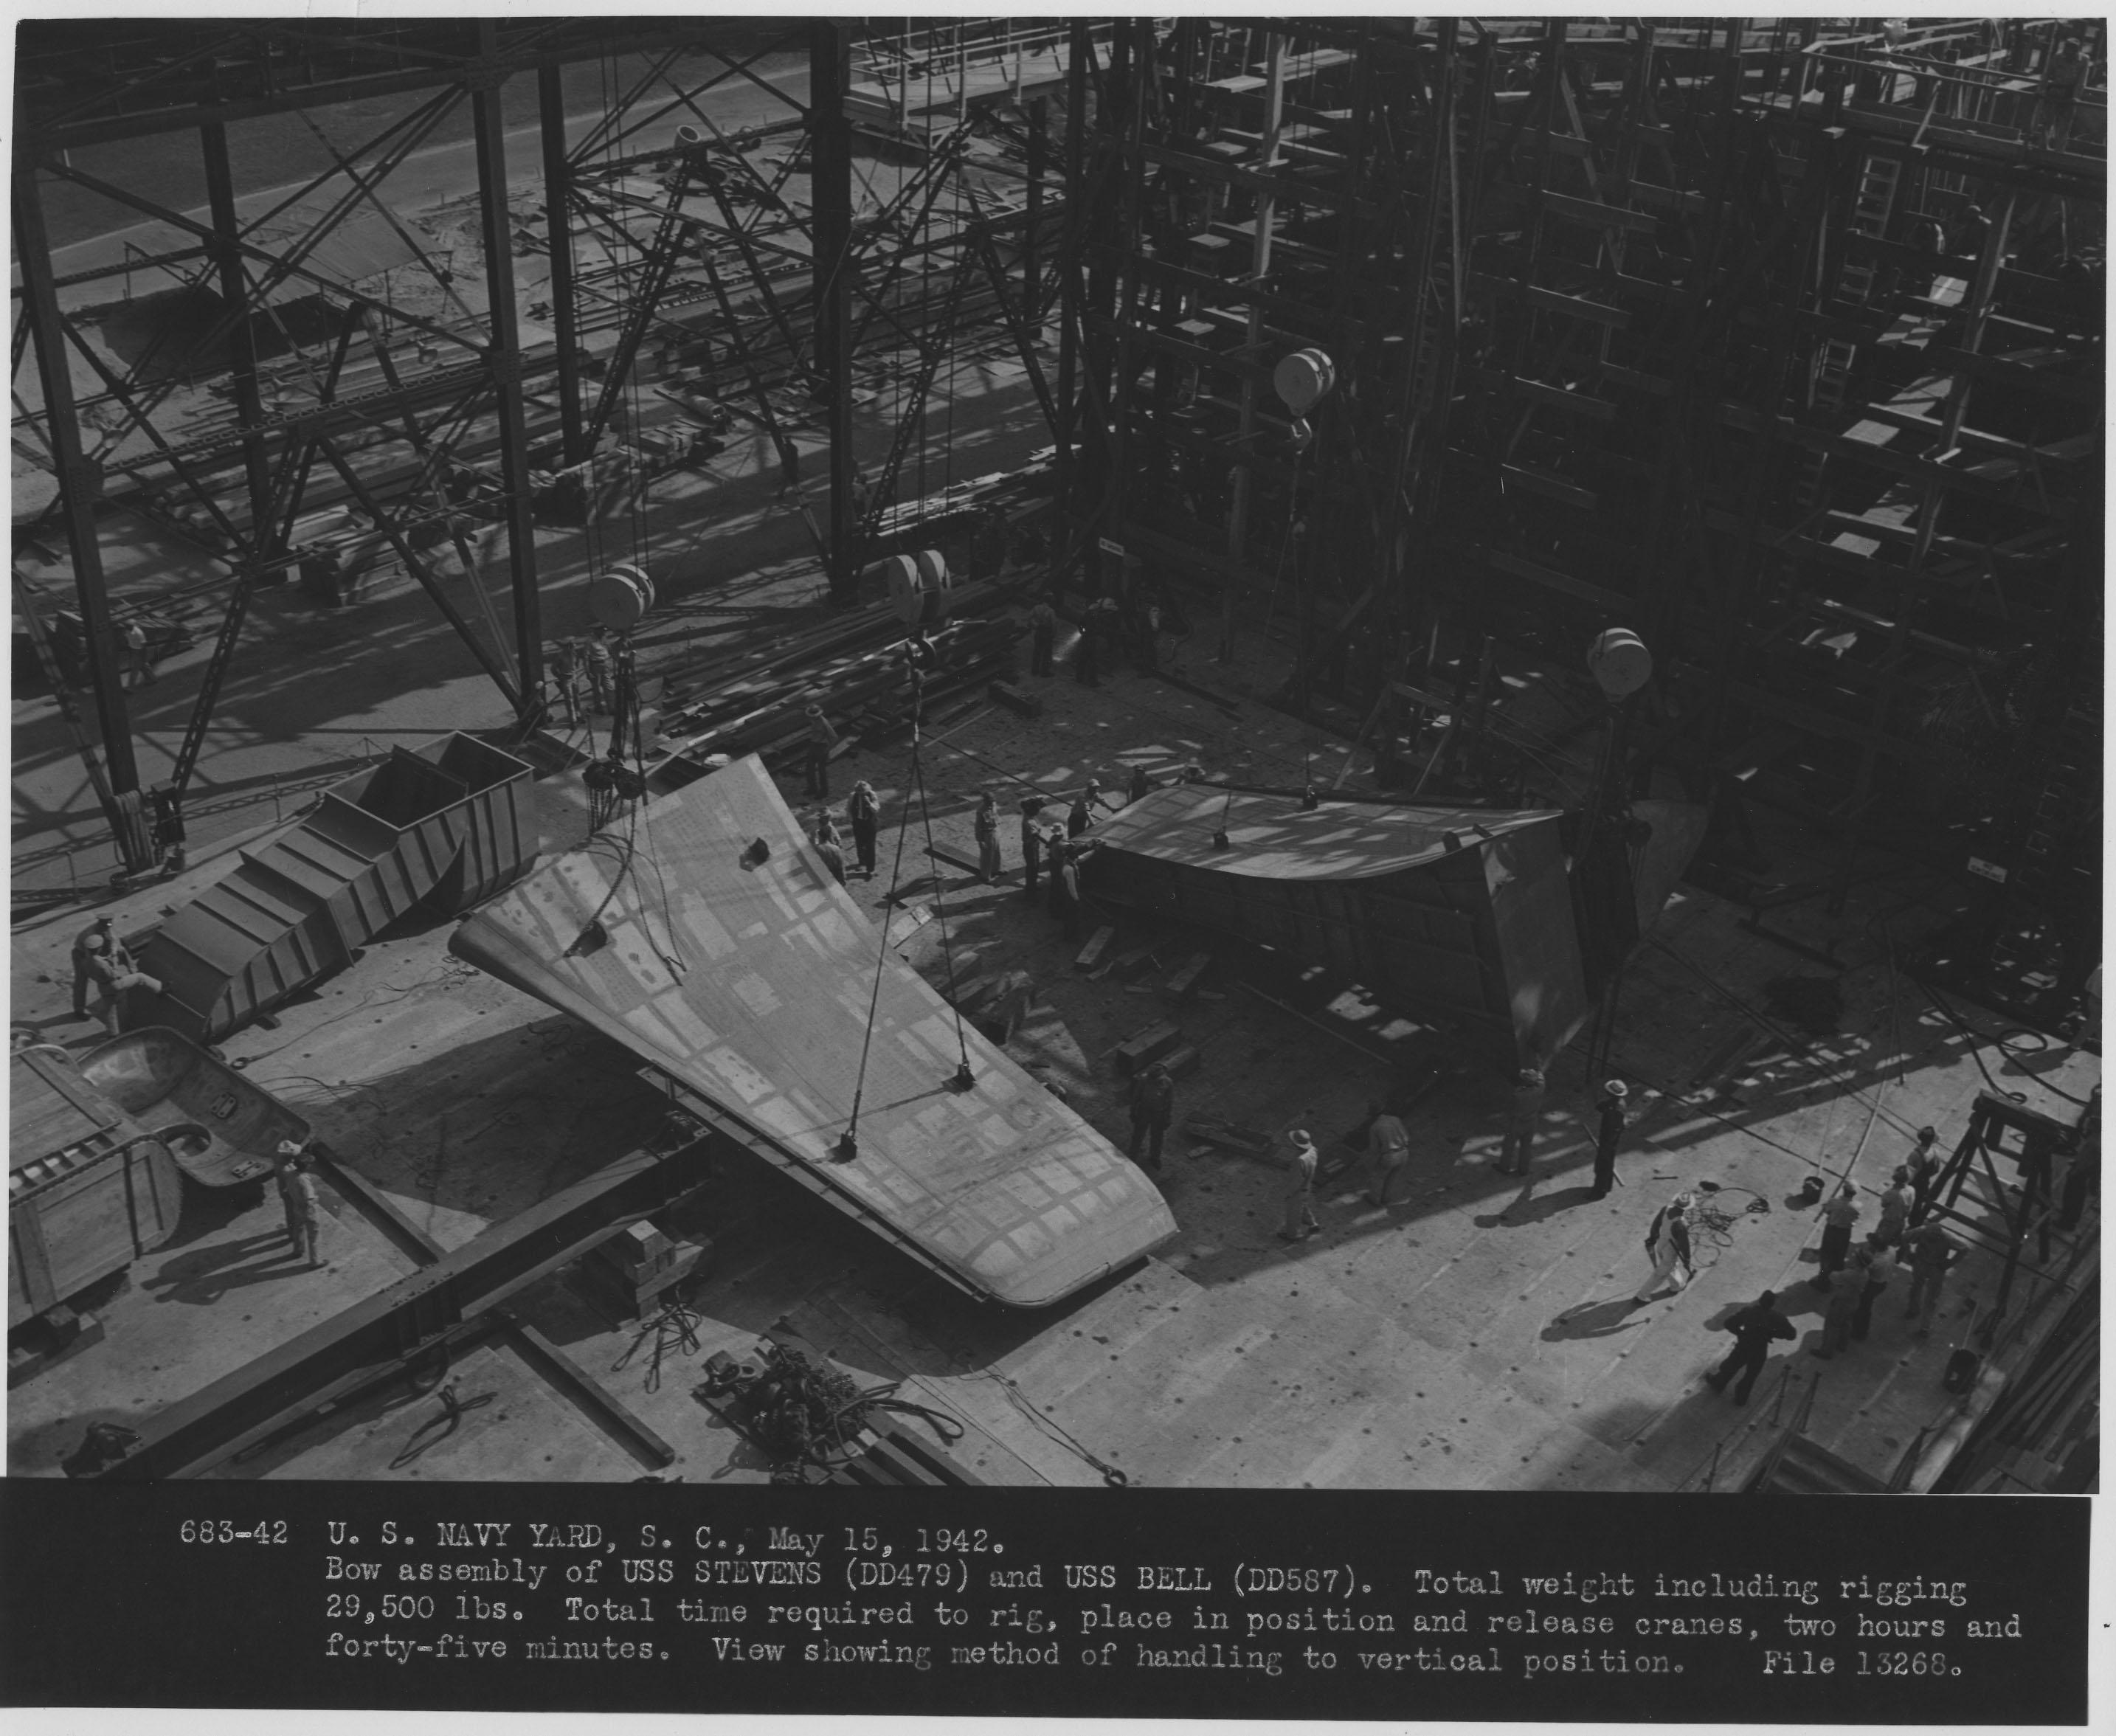 USS Stevens (DD479) and USS Bell (DD587)